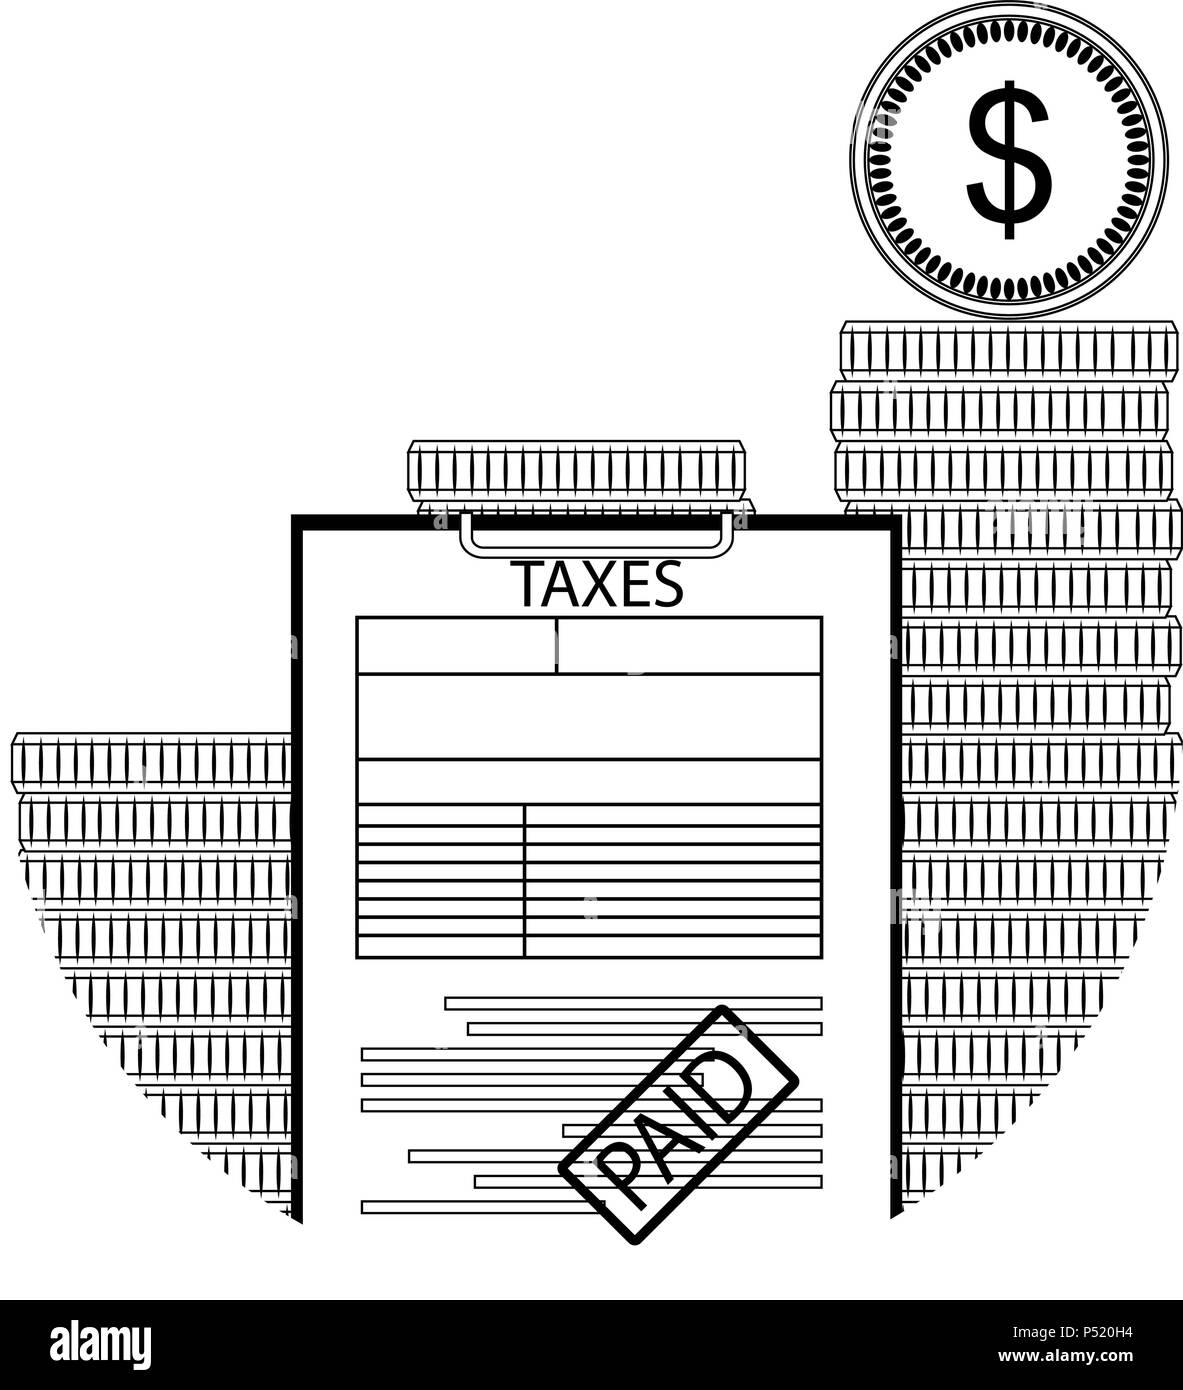 Gezahlte Steuer Line Art Besteuerung Cash Erklärung Erklärung